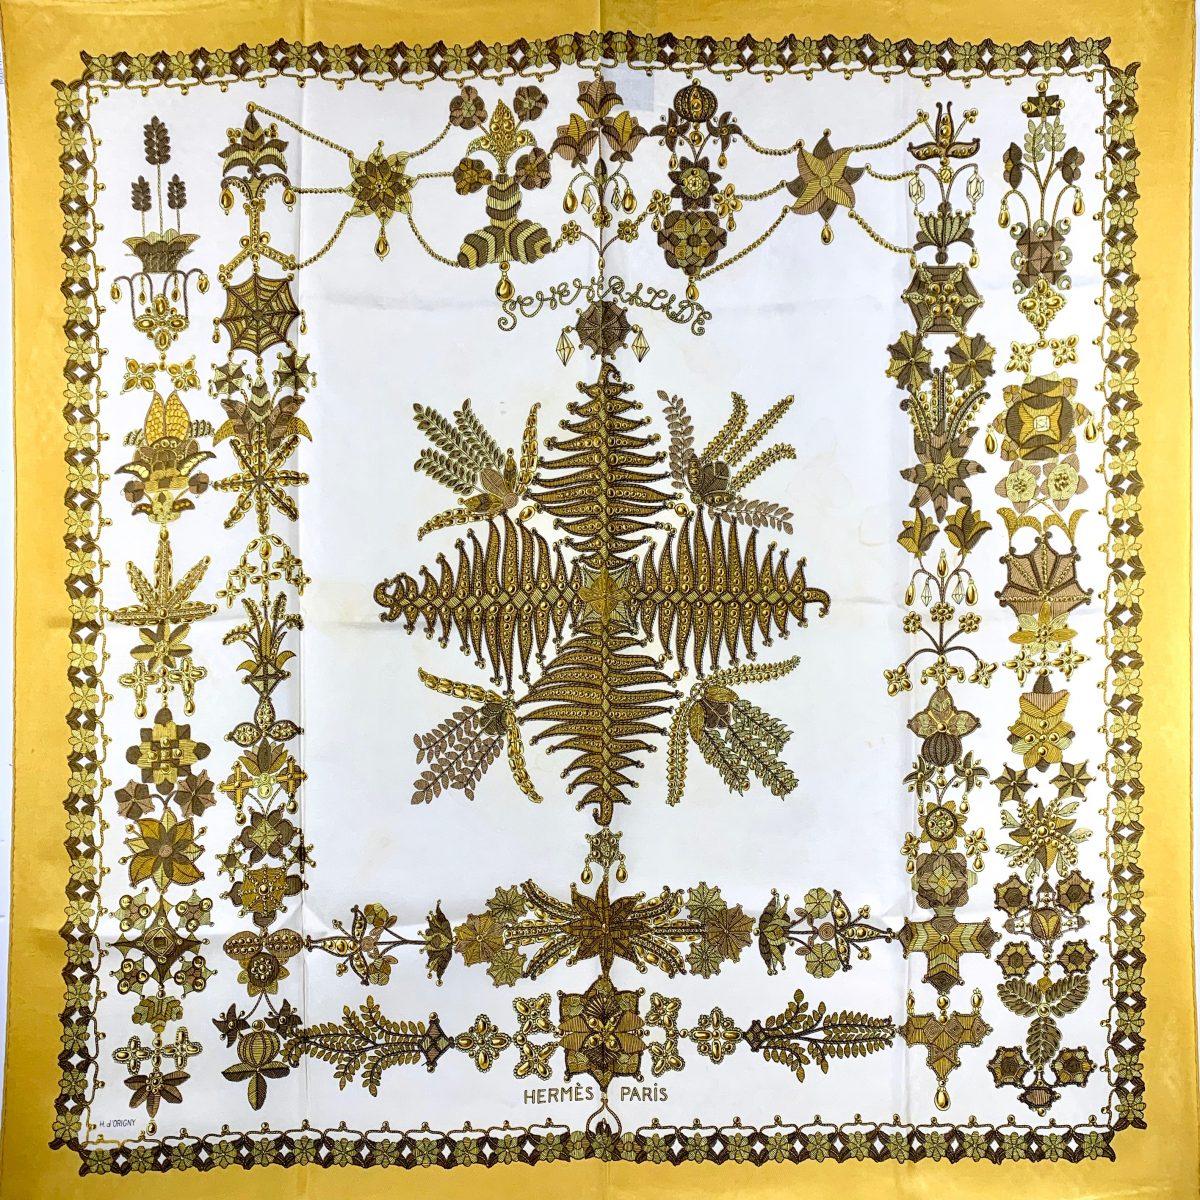 Hermès carré silk vintage mustard yellow